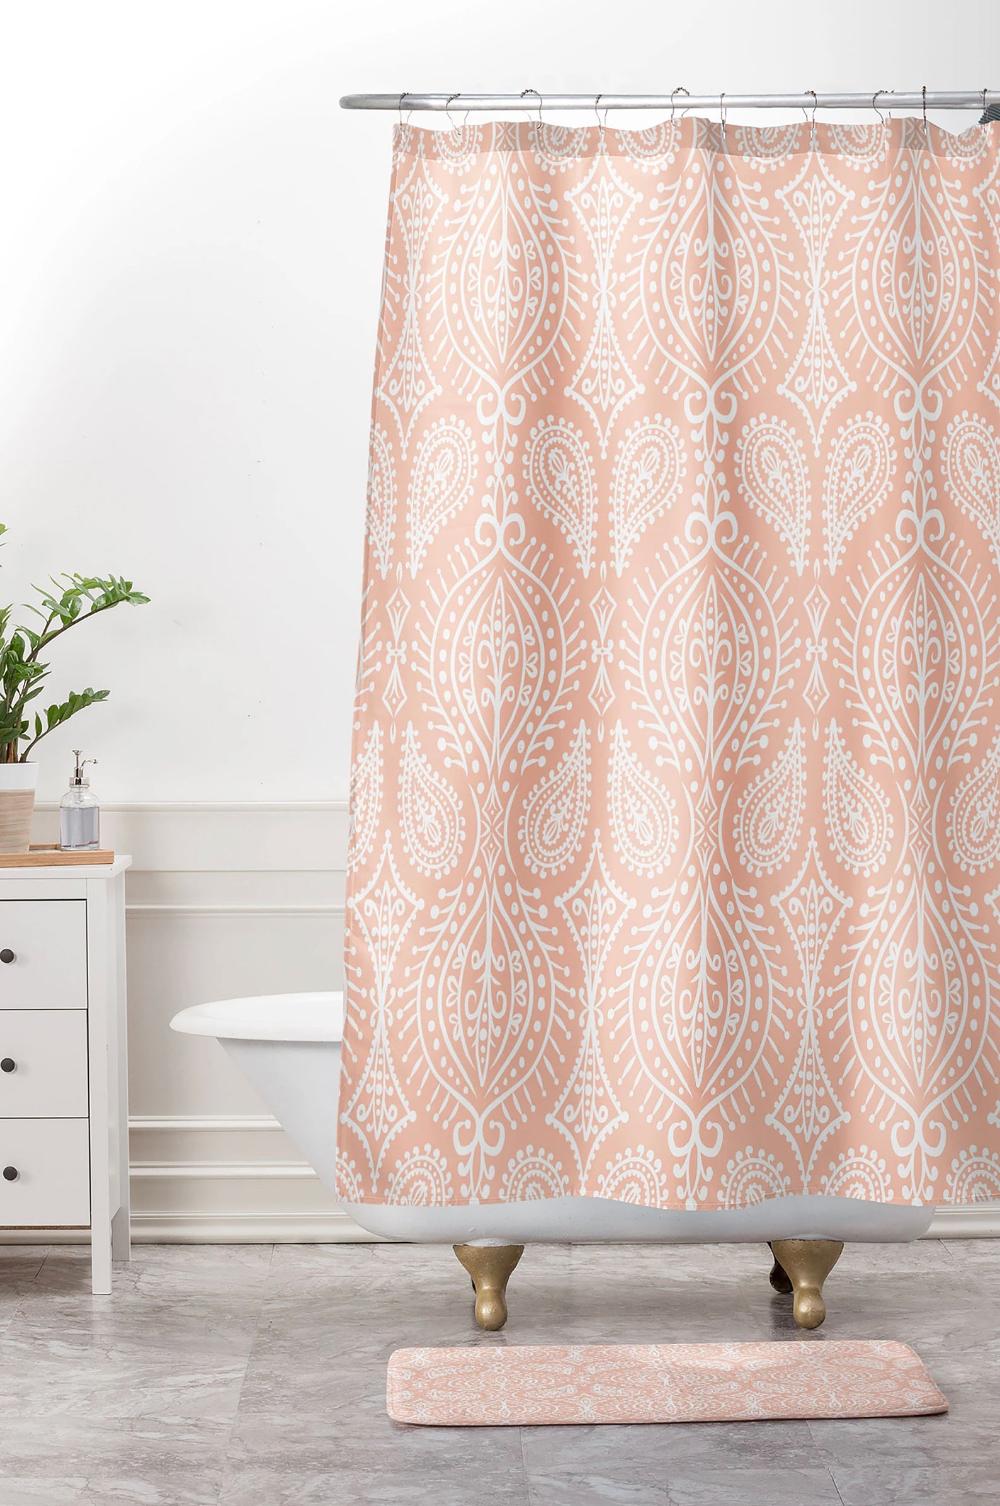 Blush Pink Shower Curtain Boho Shower Curtain Bathroom Decor